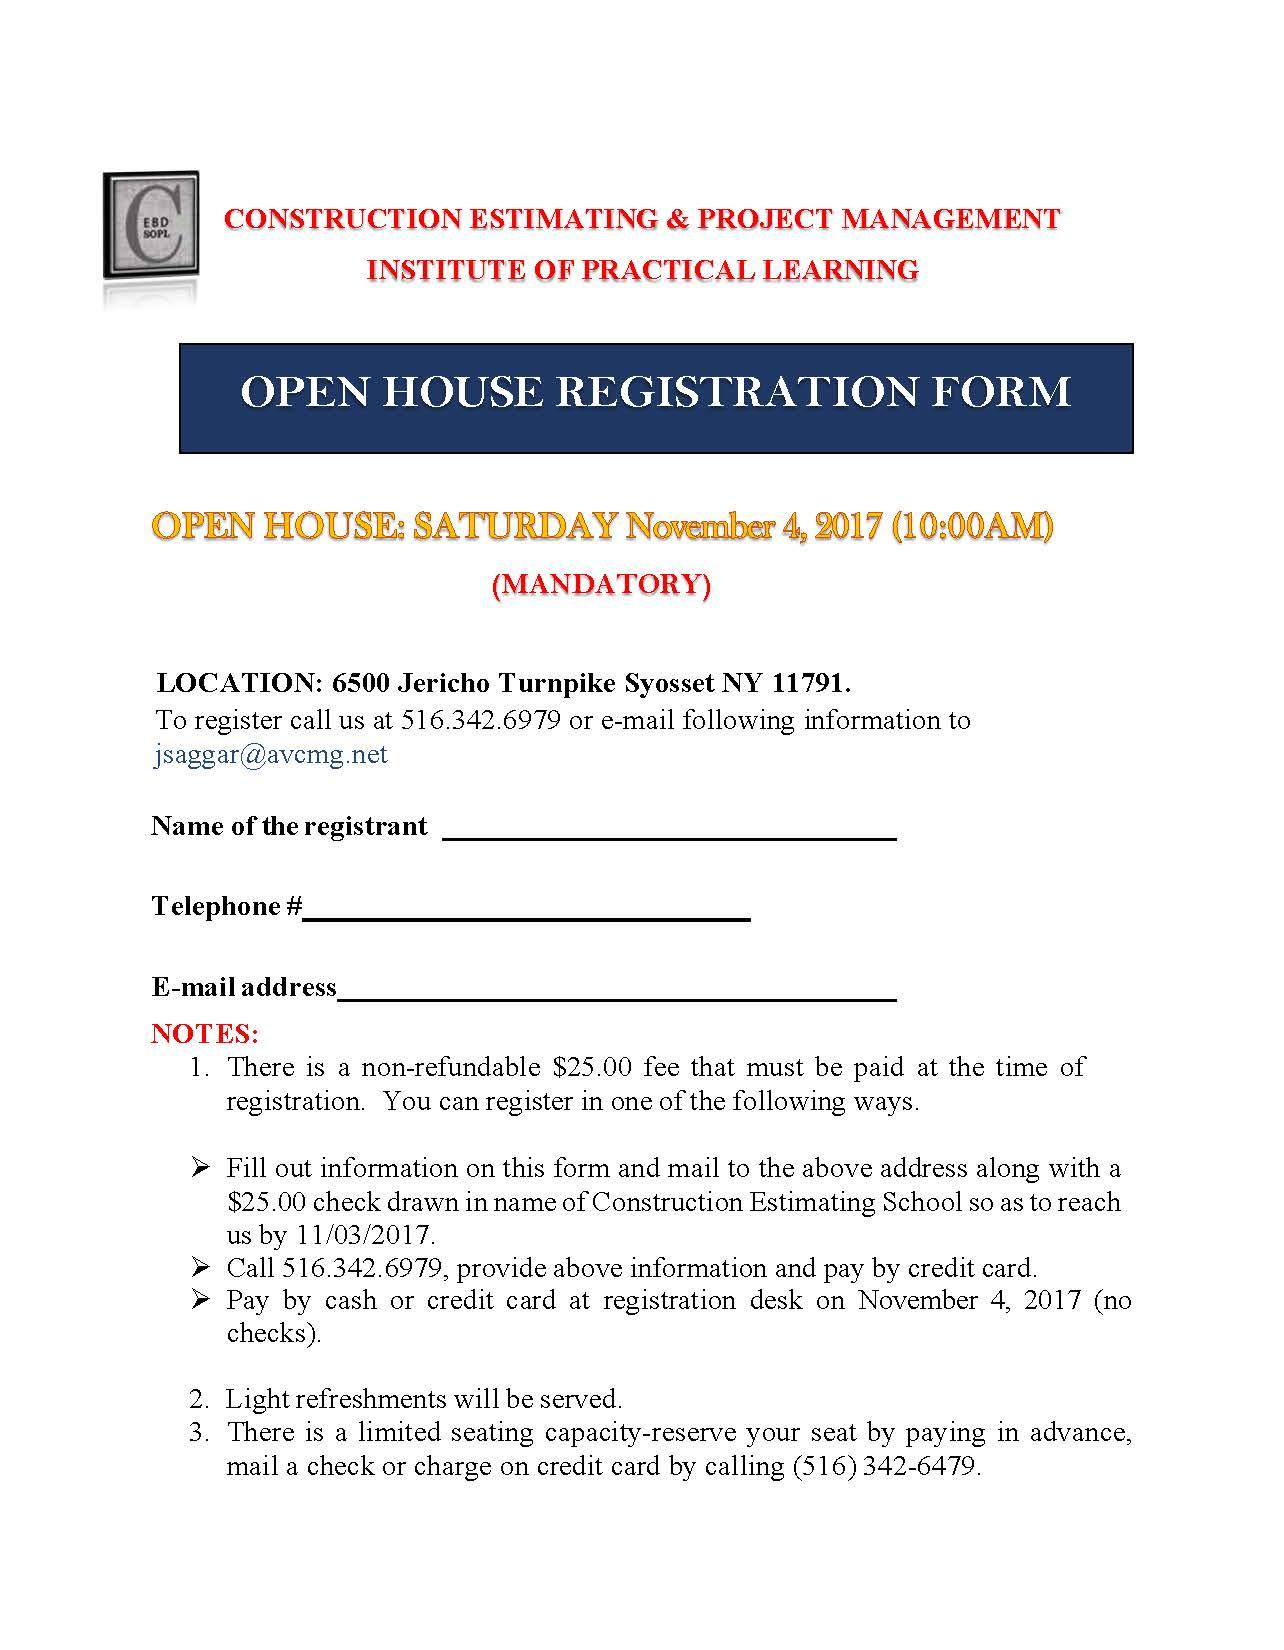 CEBD School of Practical Learning - Open House Registration